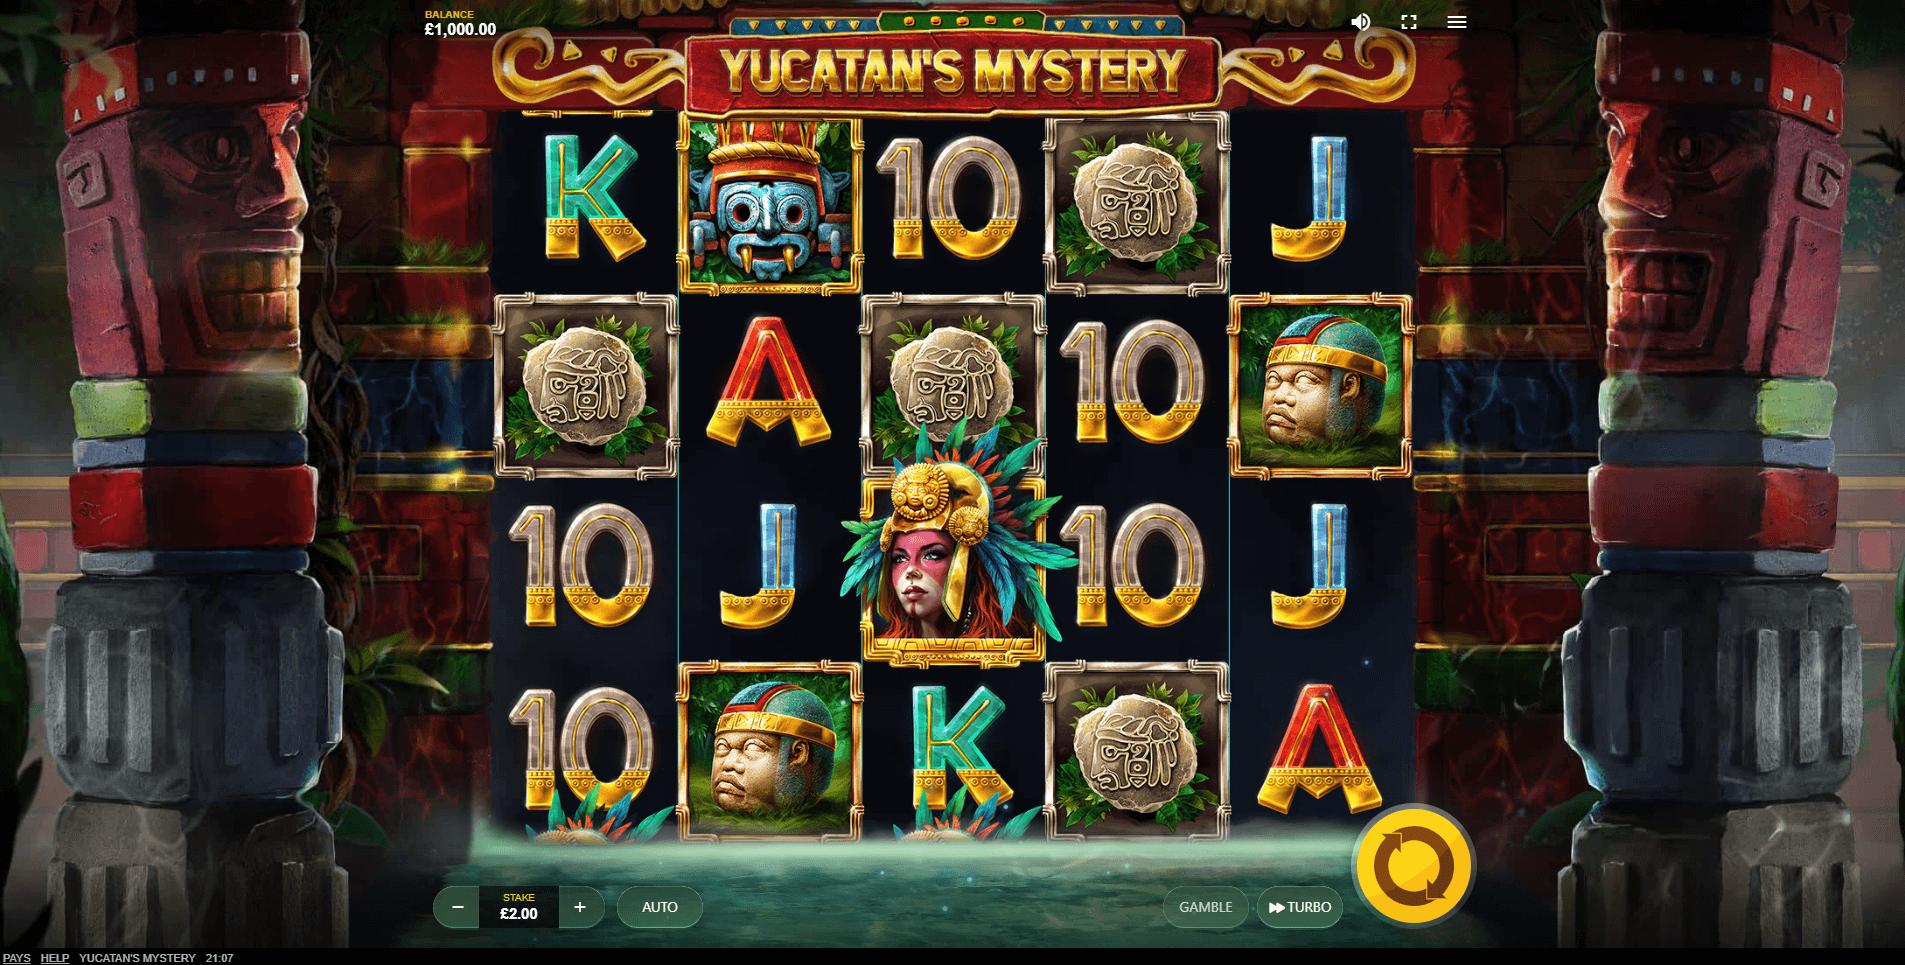 Yucatans Mystery slot machine screenshot